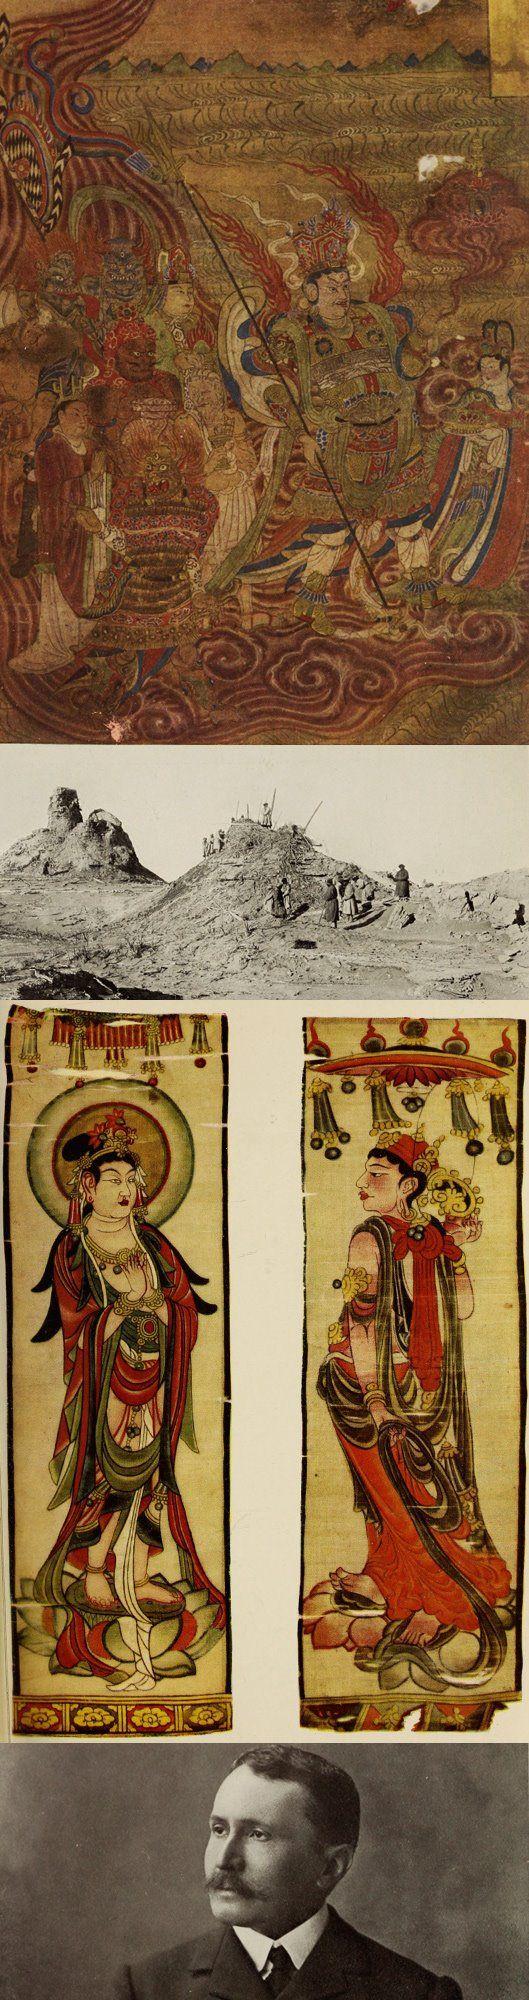 ruins-of-desert-cathay10